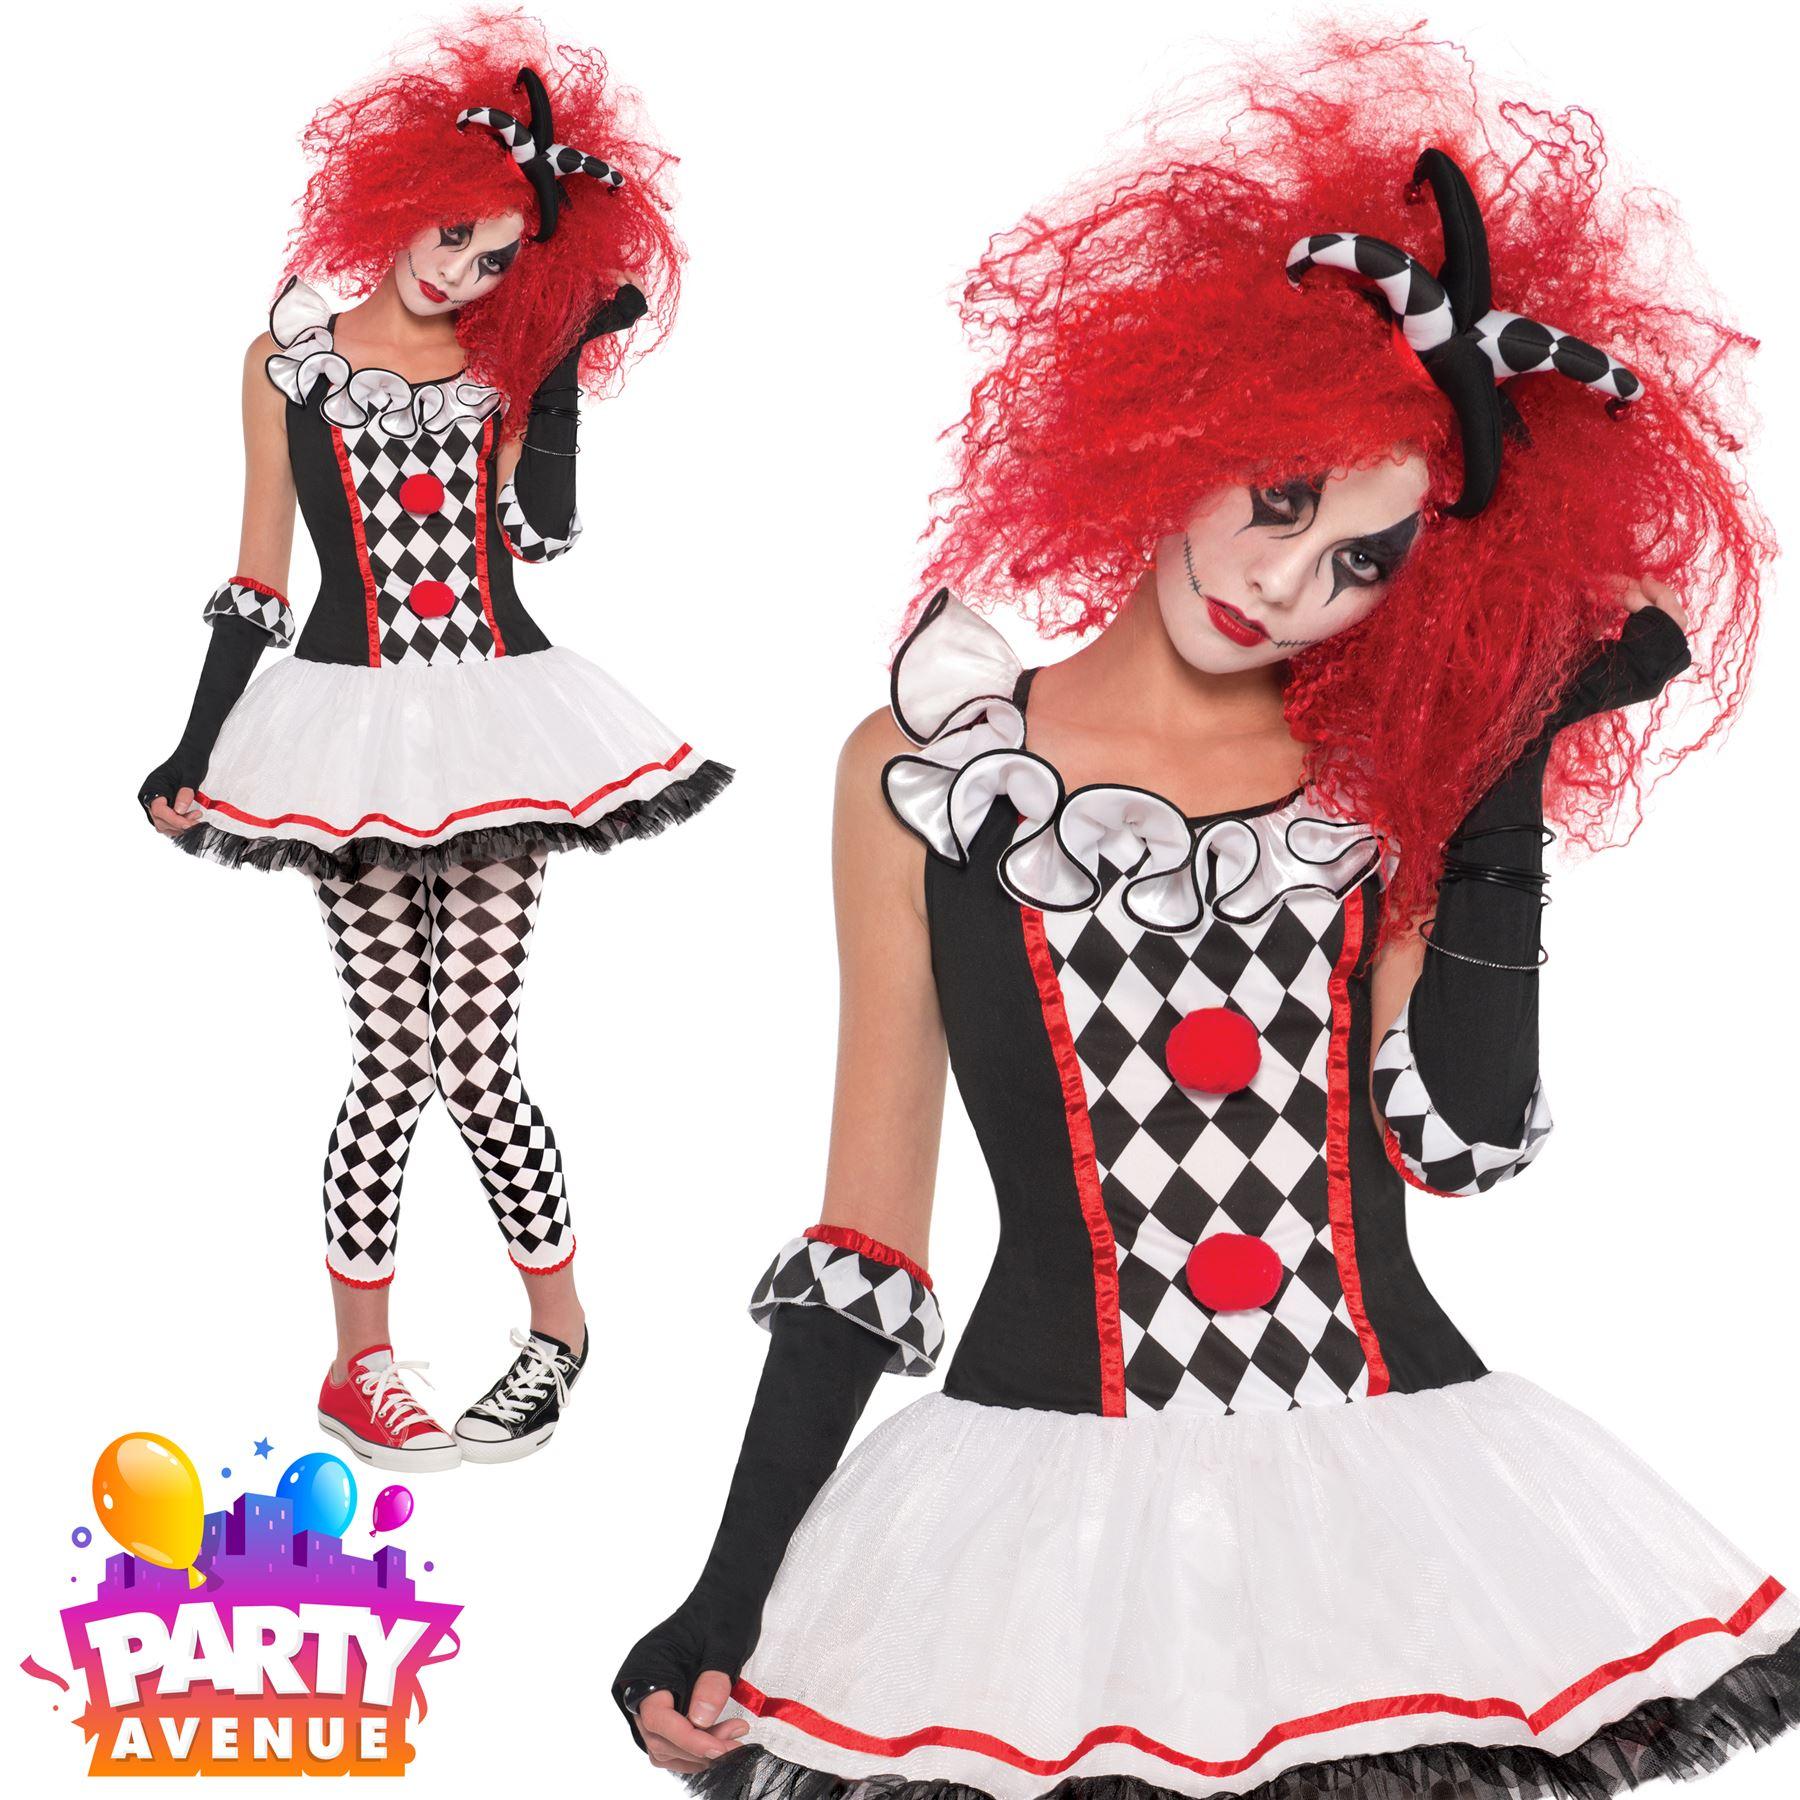 Halloween Clown Girl Outfit.Details About Girls Harlequin Honey Clown Halloween Costume Fancy Dress Outfit